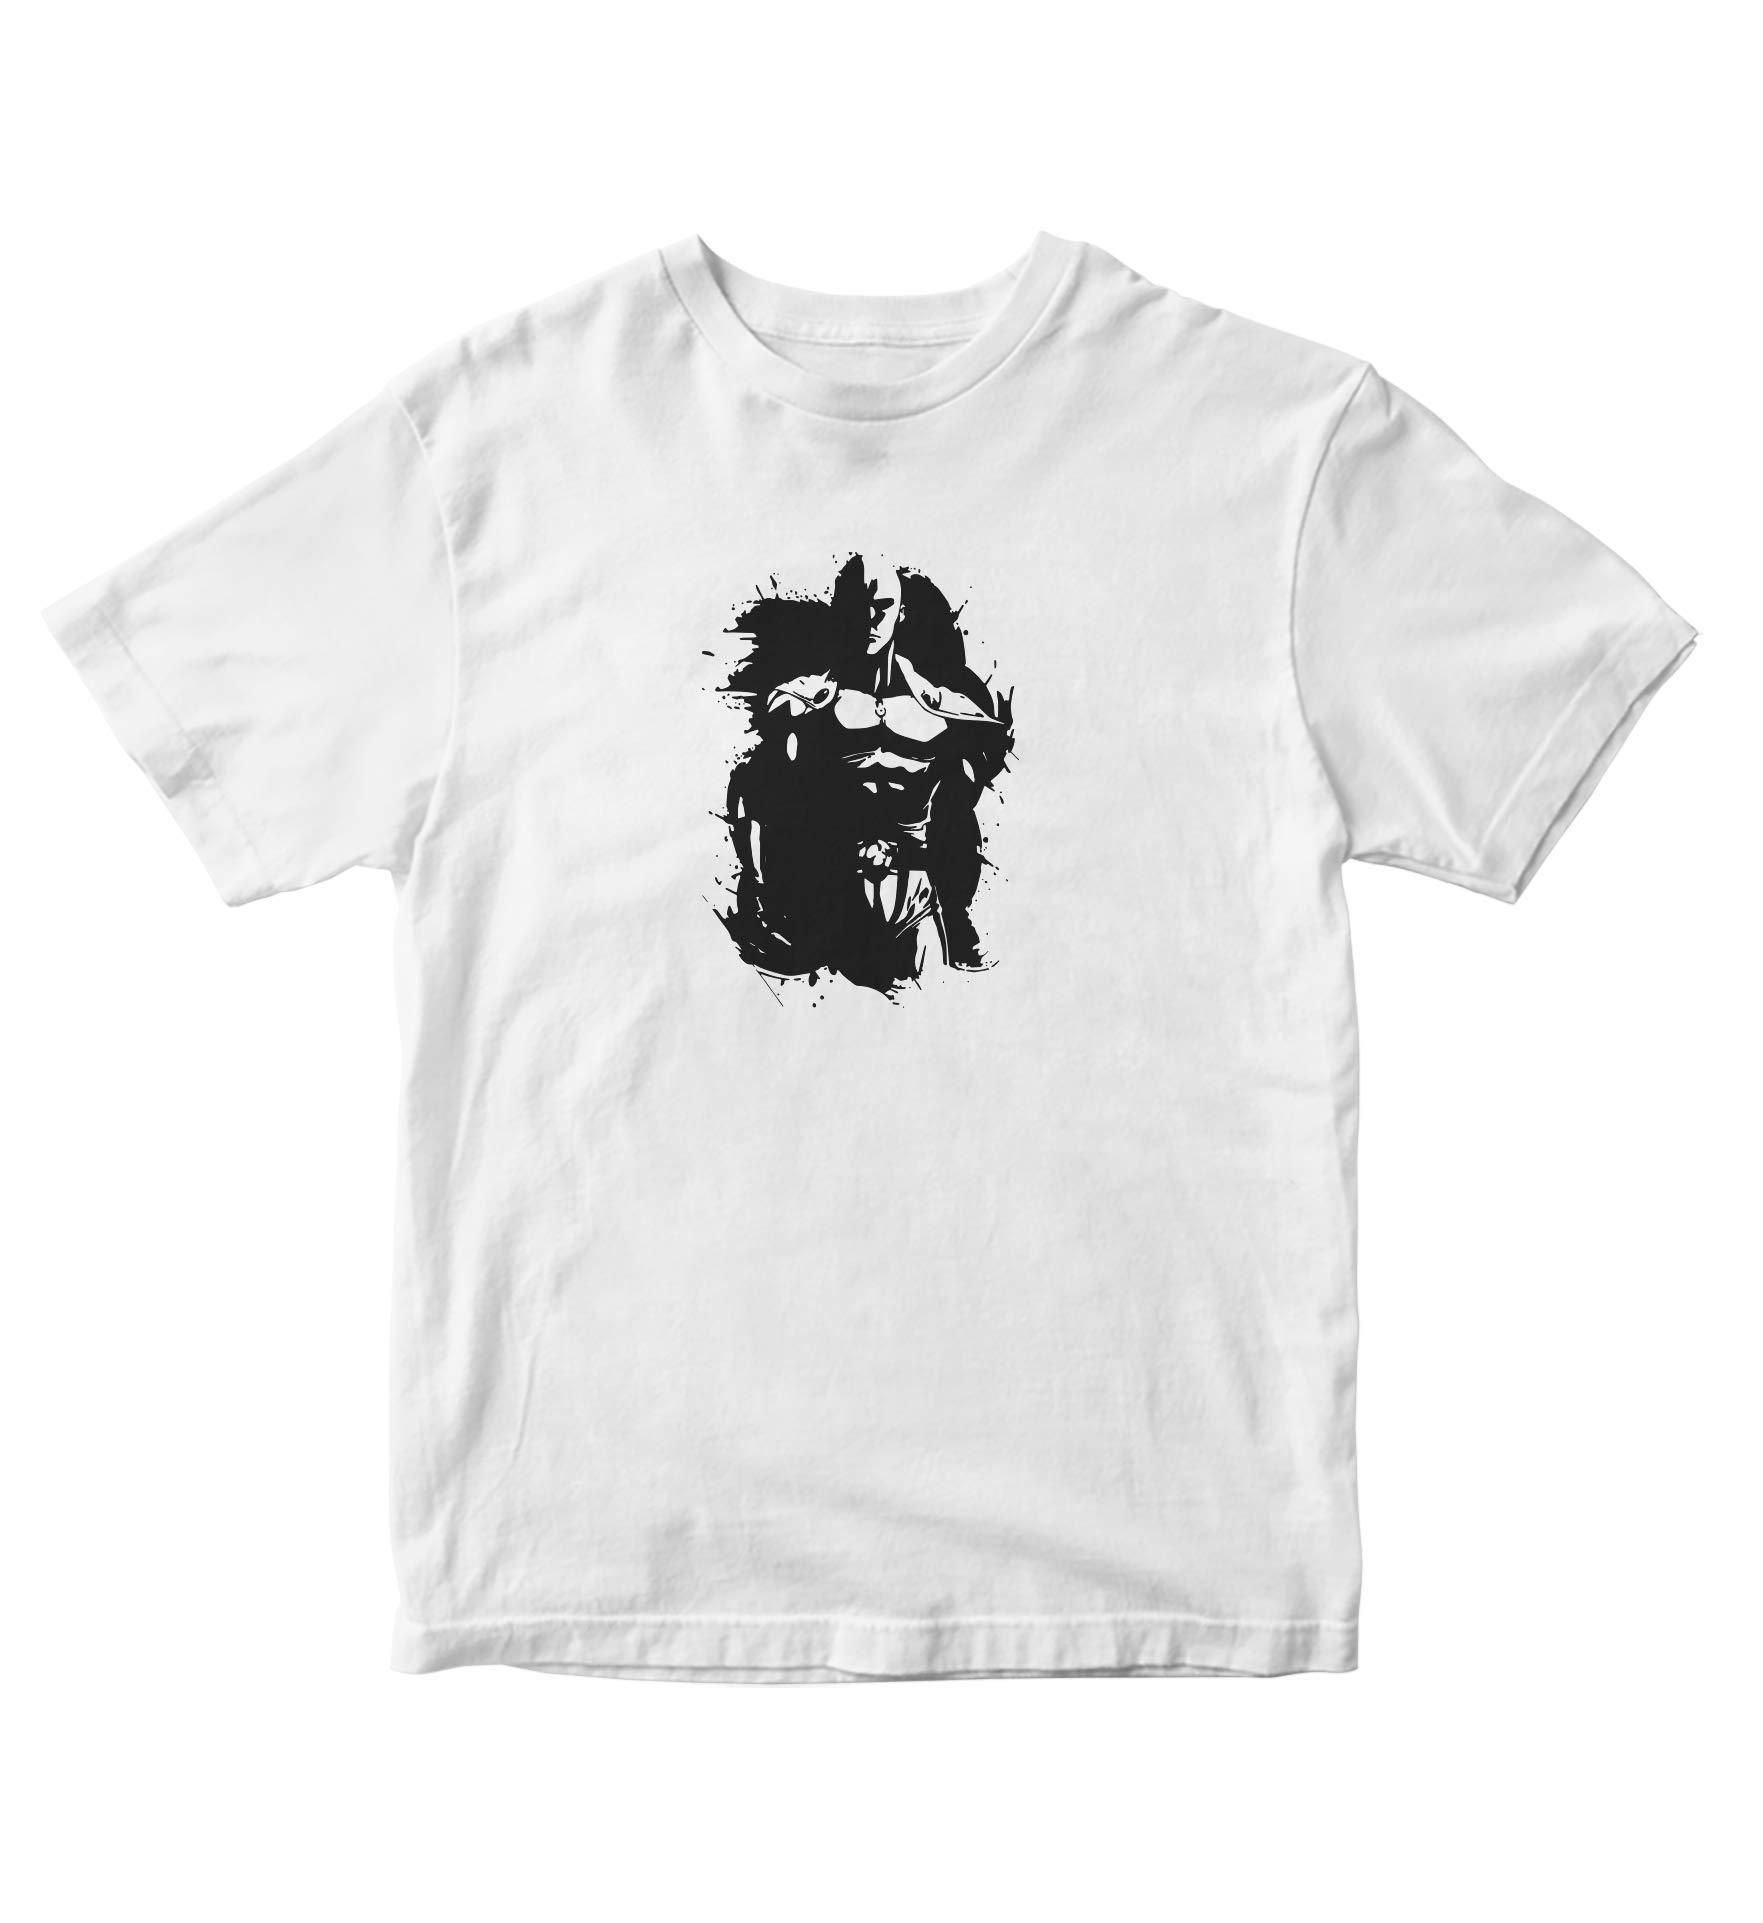 Saitama Shirt Silhouette One Punch Man Anime Manga Man S A838